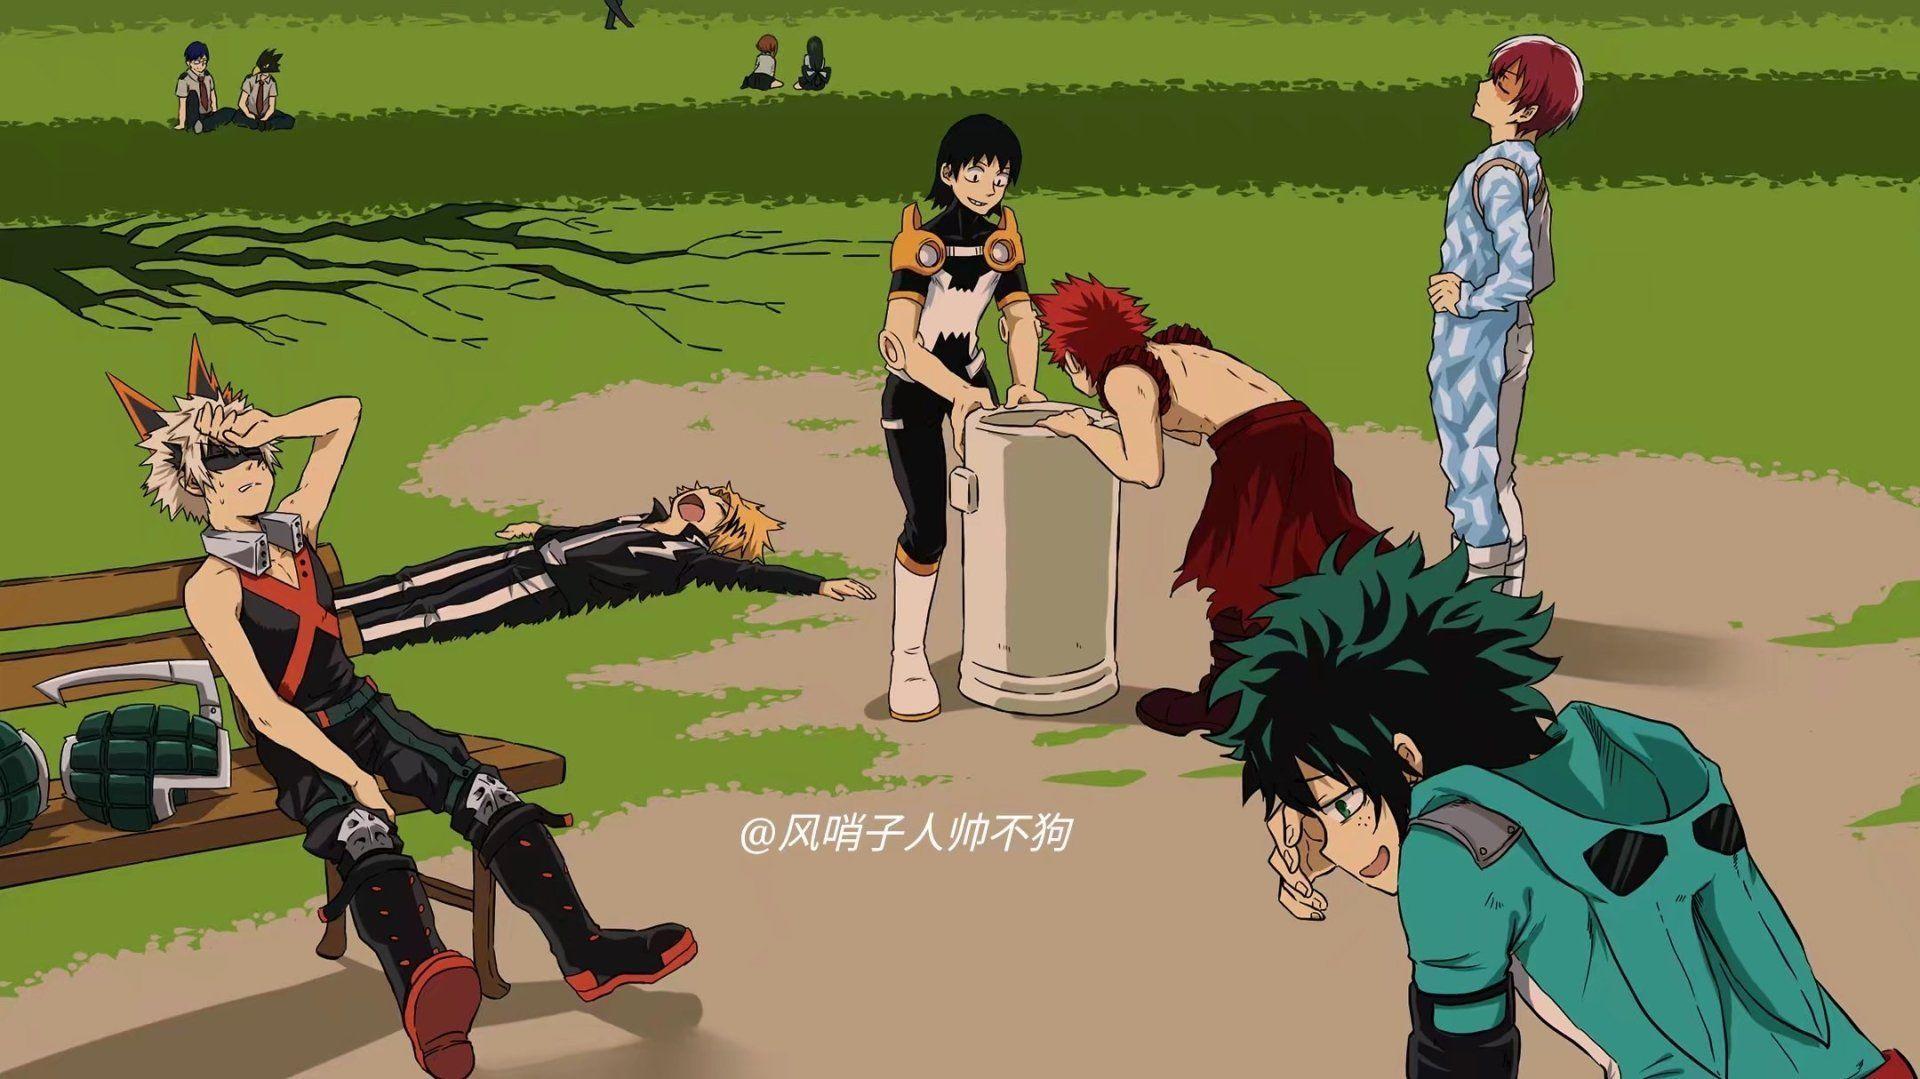 Cool features, hd my hero academia anime wallpaper backgrounds. My Hero Academia Deku X Bakugou X Todoroki Wallpapers ...